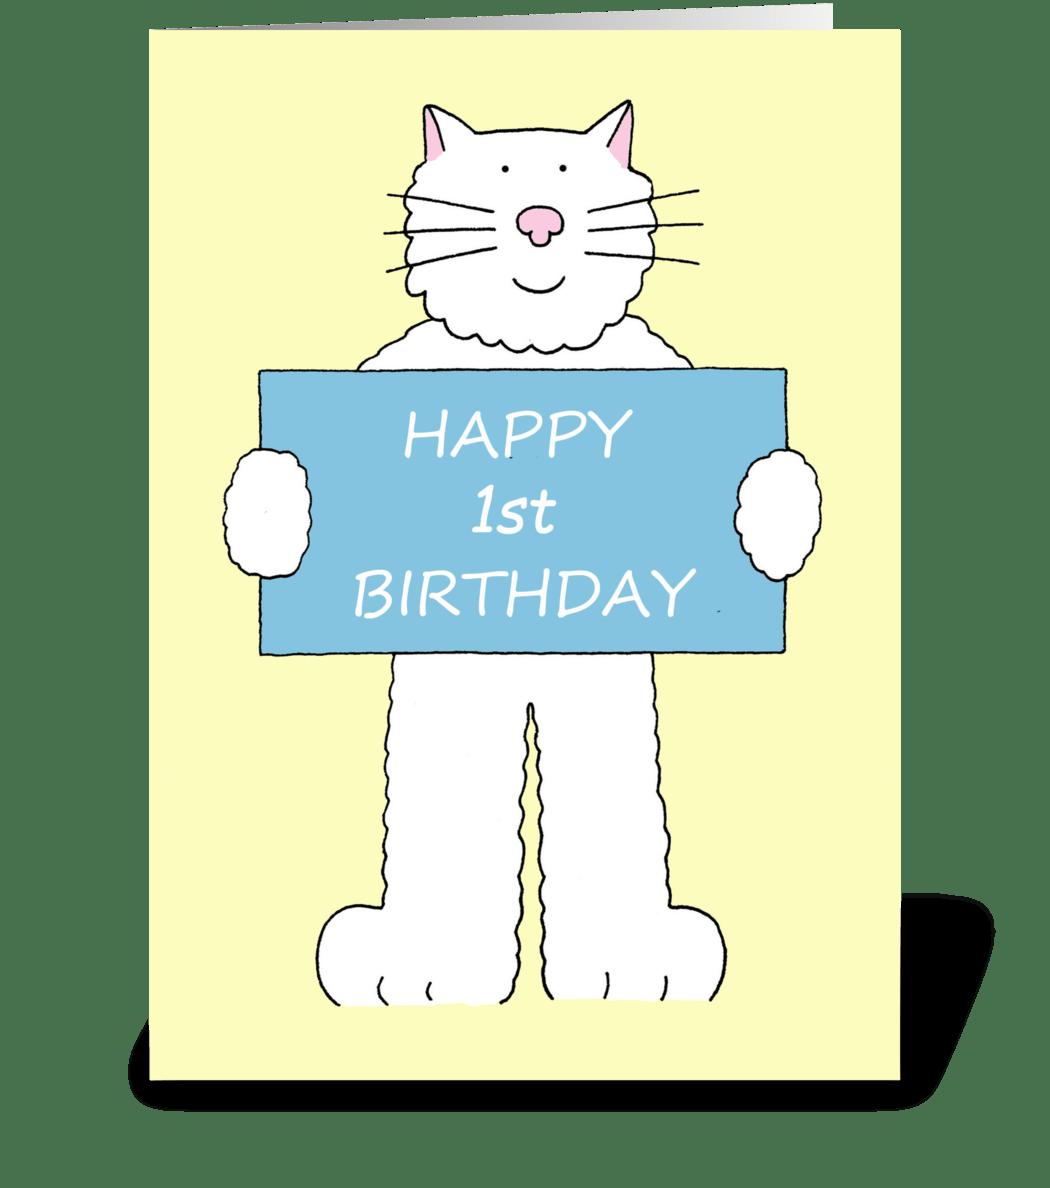 Happy 1st Birthday Cute Cat